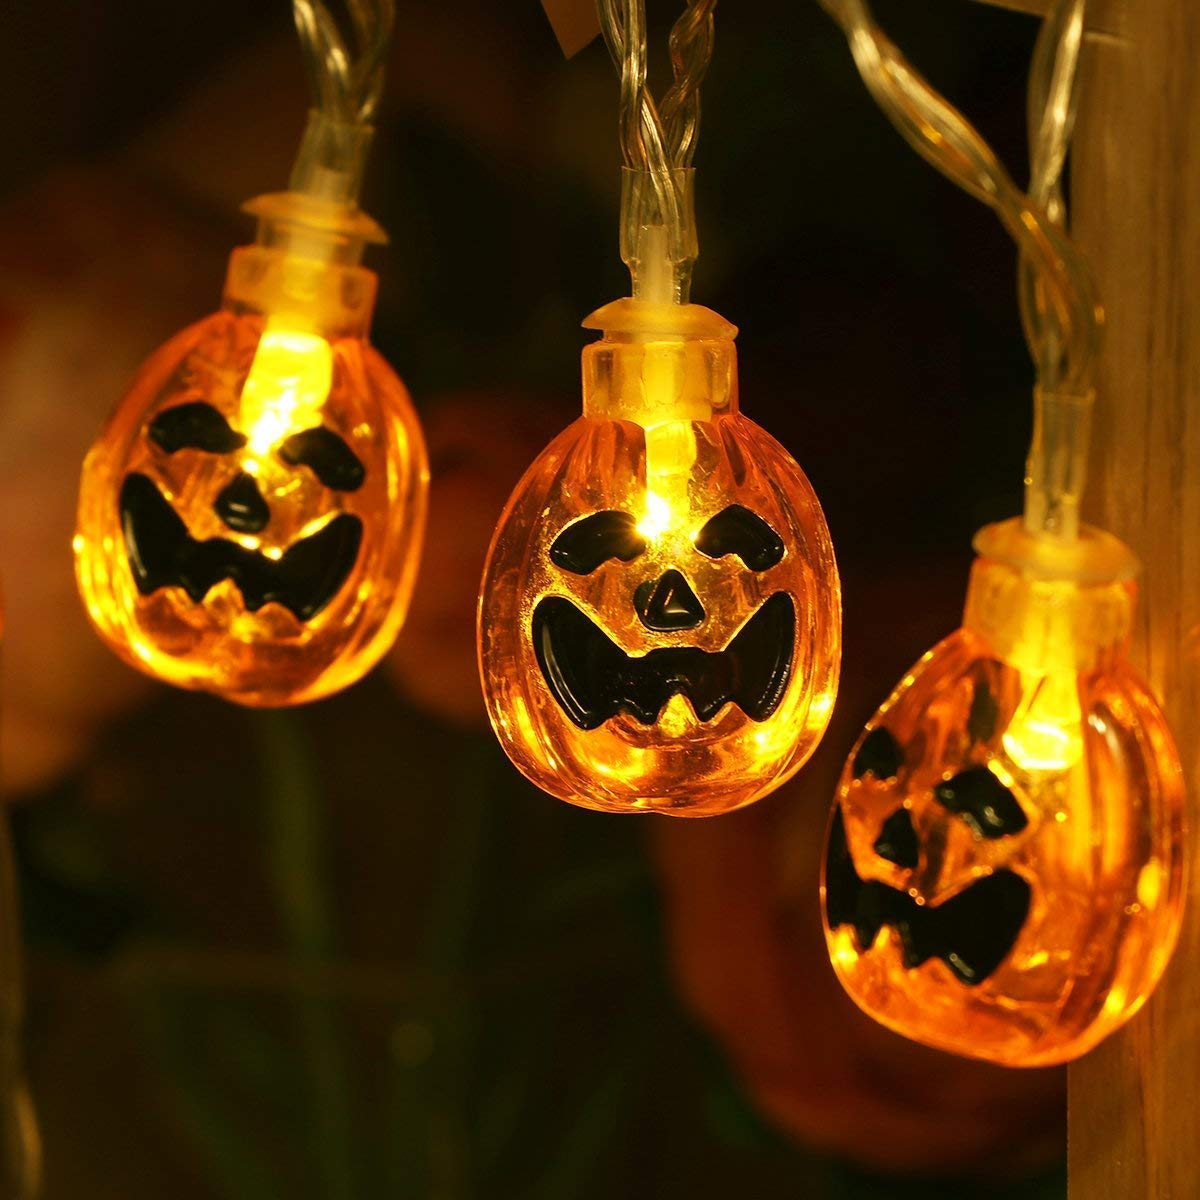 W-ShiG Halloween Pumpkin String Lights,30 LEDs Pumpkin Solar Power String Lights for Halloween Decoration